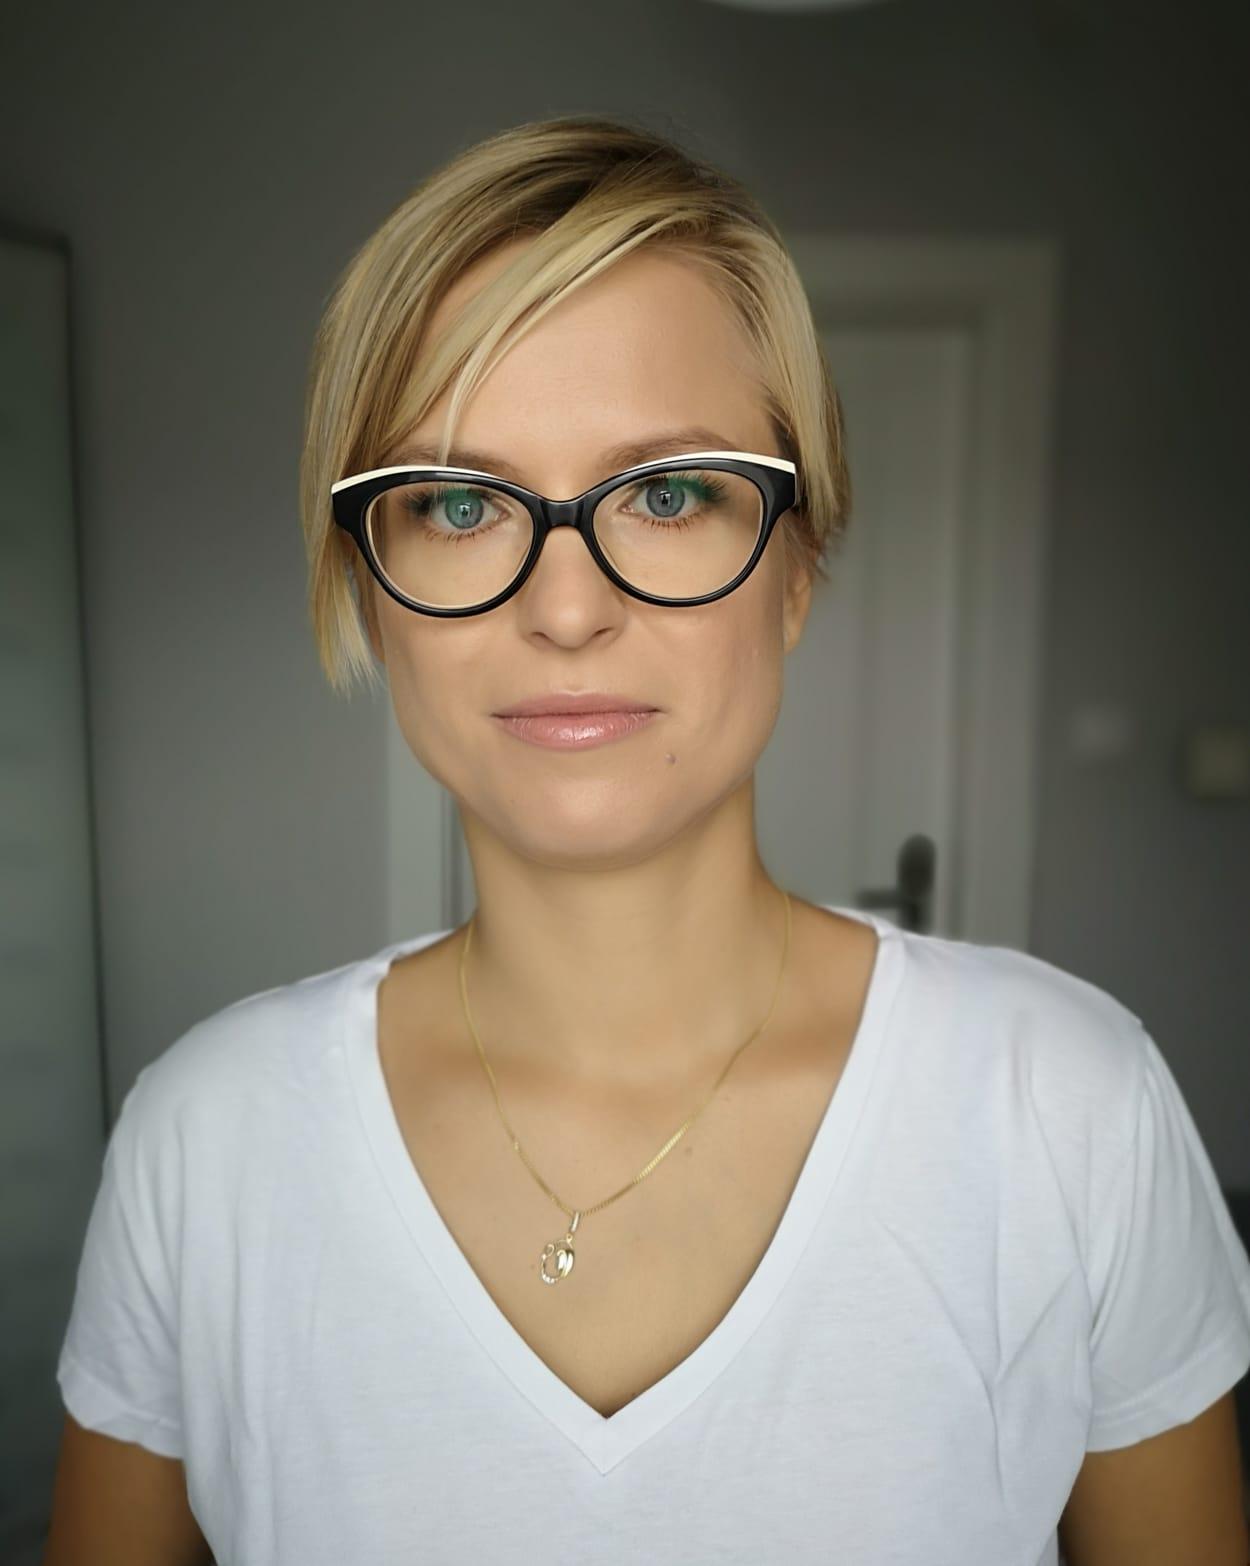 Arleta Gomuła Krzyżanowska